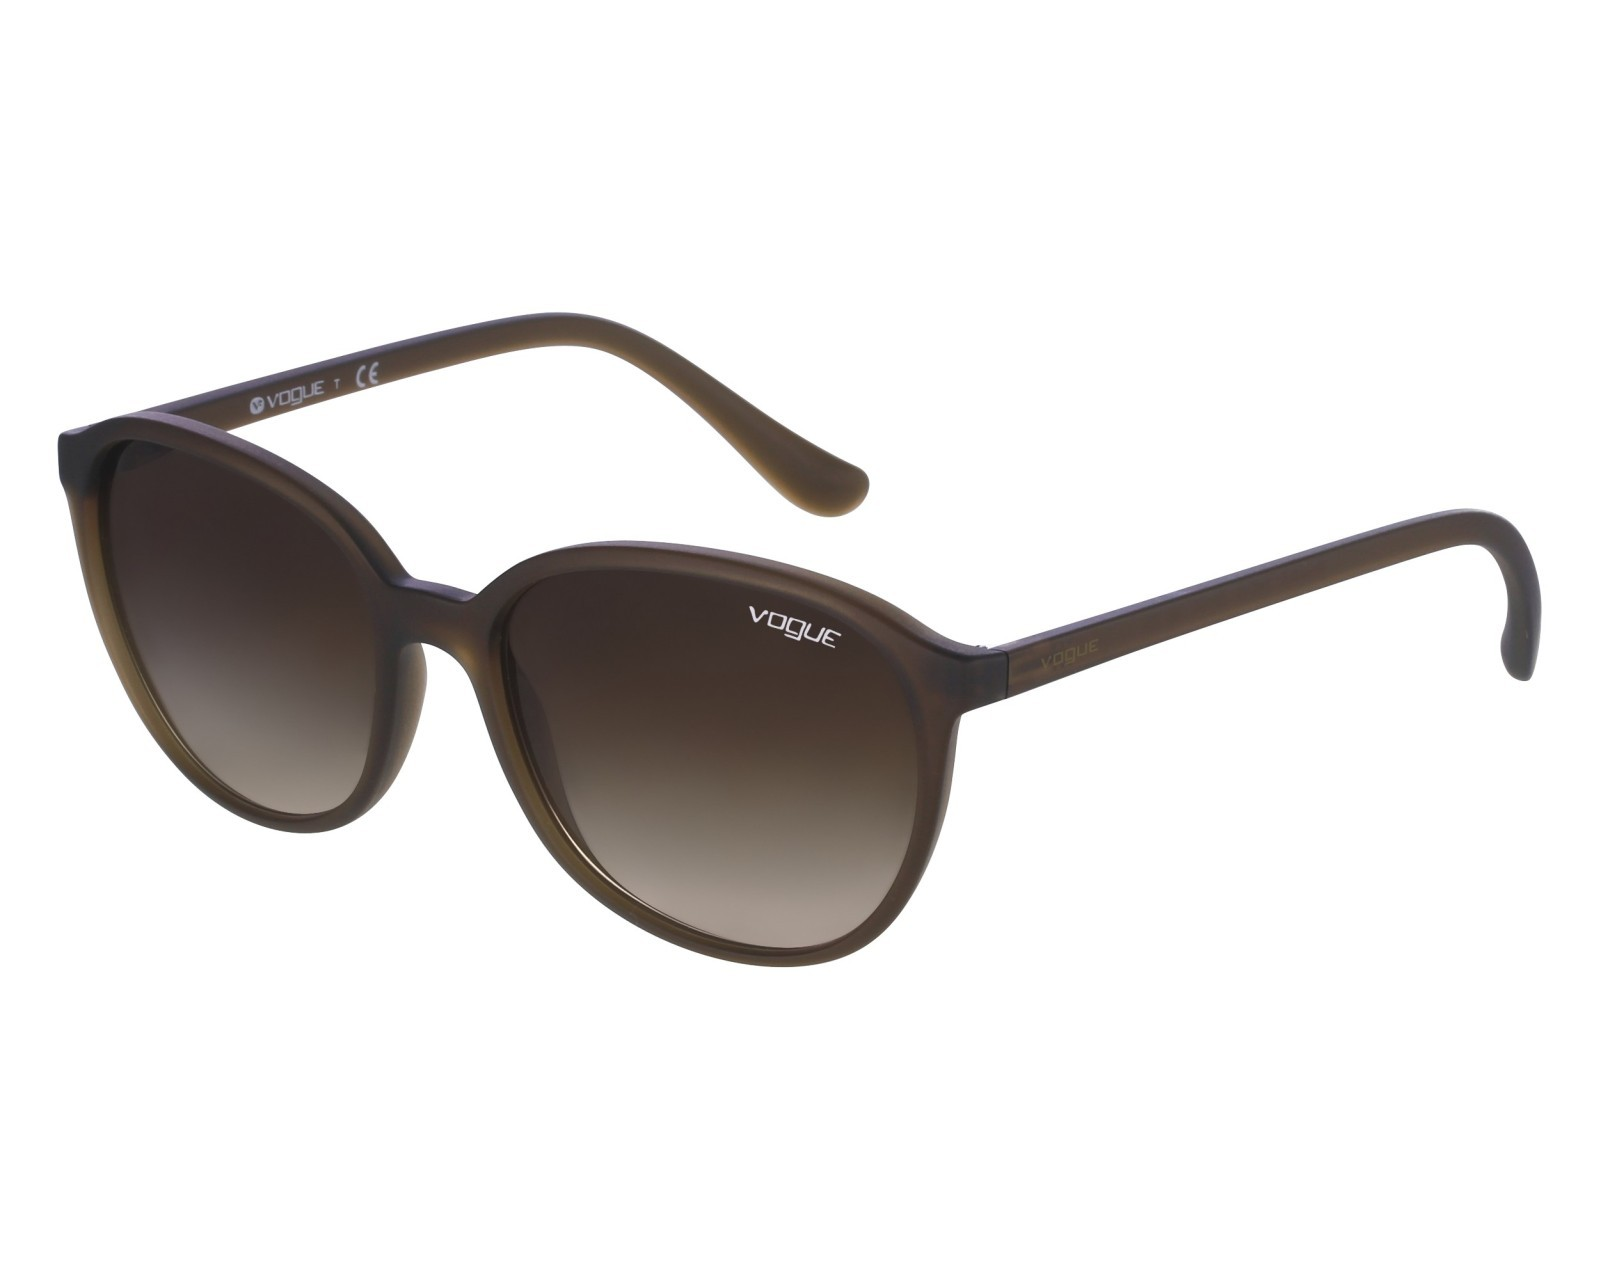 cb1fcd88ce1 Γυαλιά Ηλίου Vogue VO 2939-S 2280/13, Γυαλιά Ηλίου Vogue